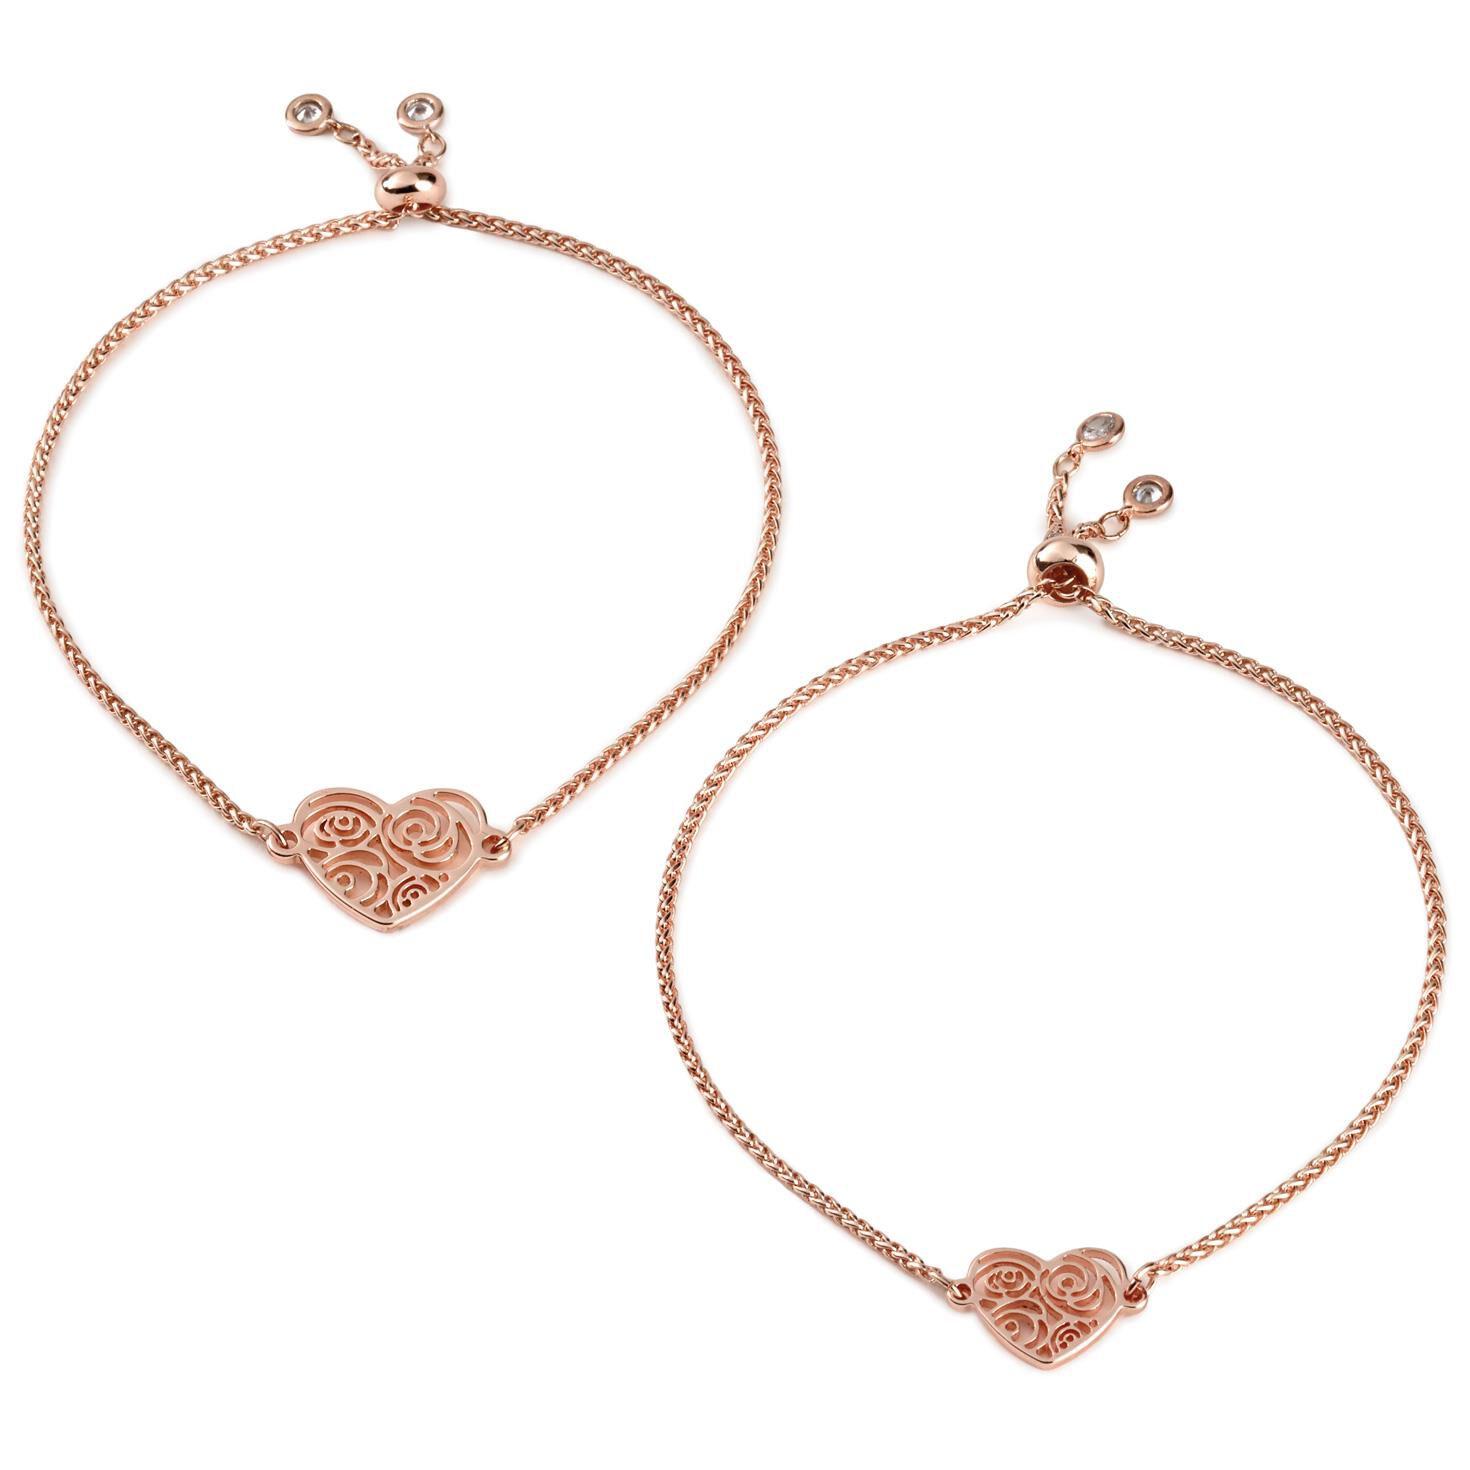 Mark Hall Rose Gold Filigree Heart Bolo Bracelets Set of 2